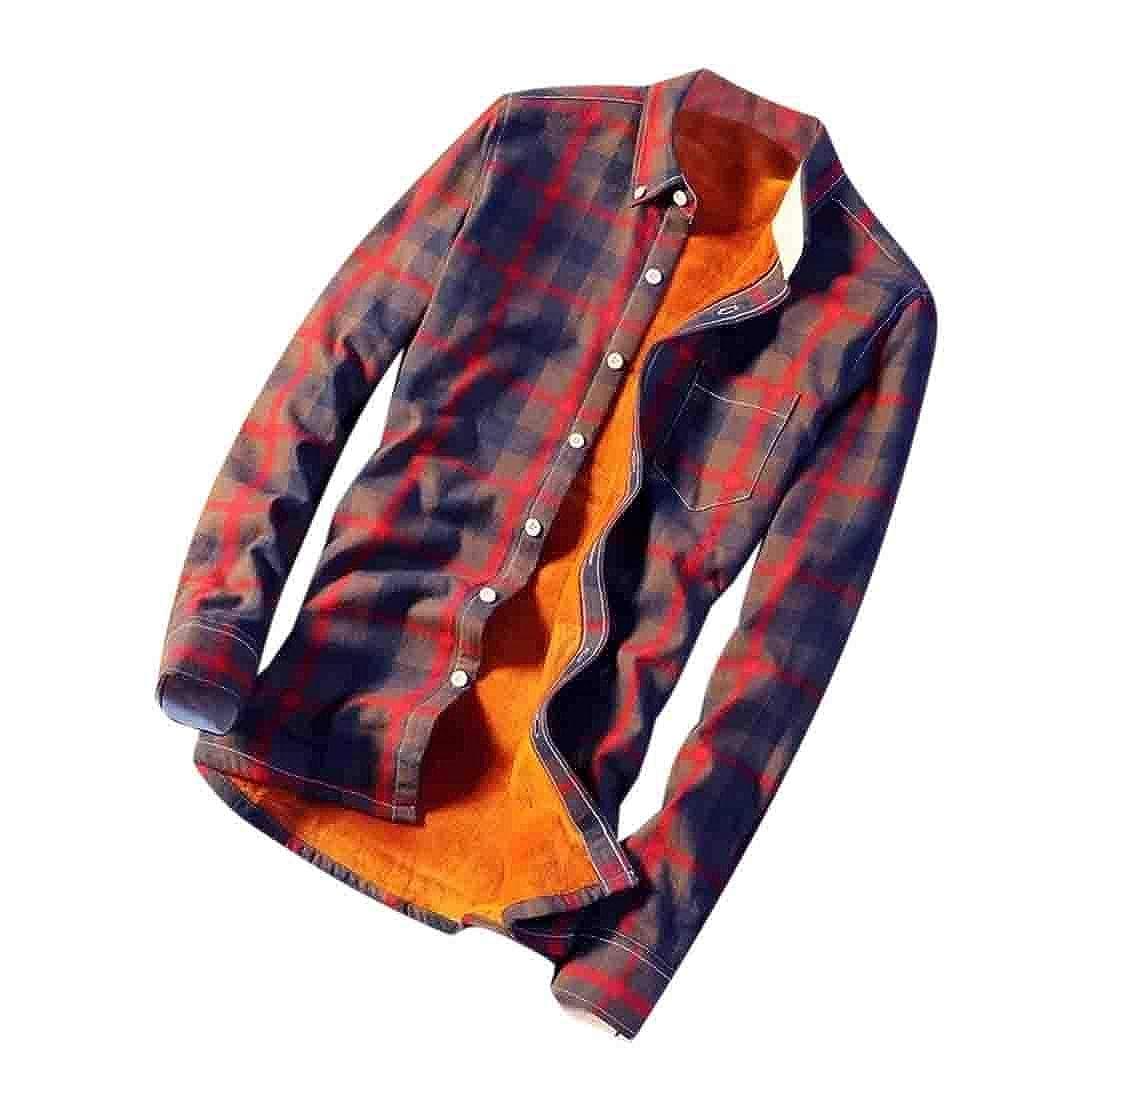 UUYUK Men Plaid Thickened Button Down Casual Fleece Shirts